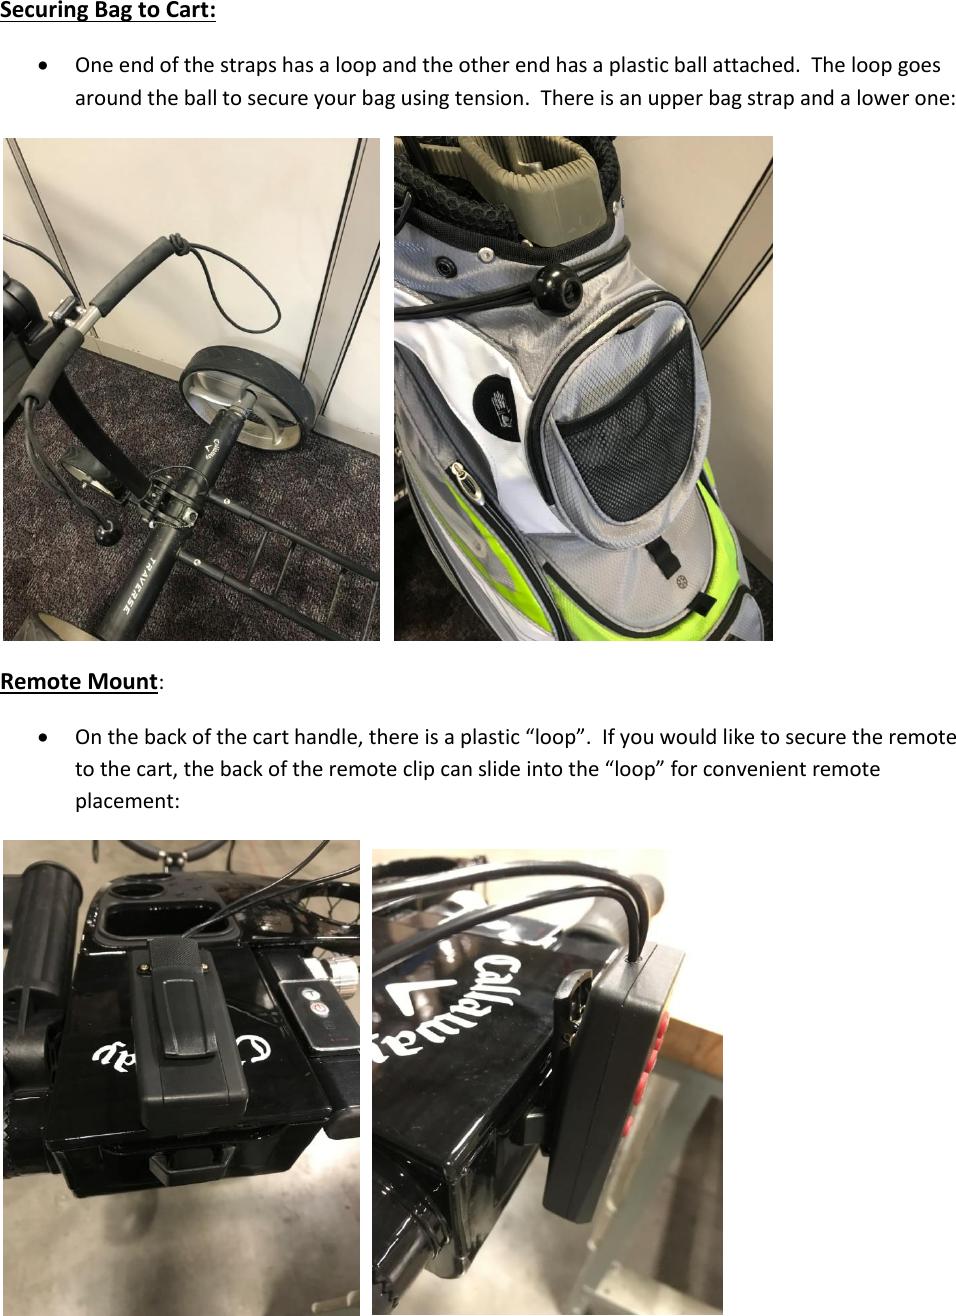 izzo golf net assembly instructions